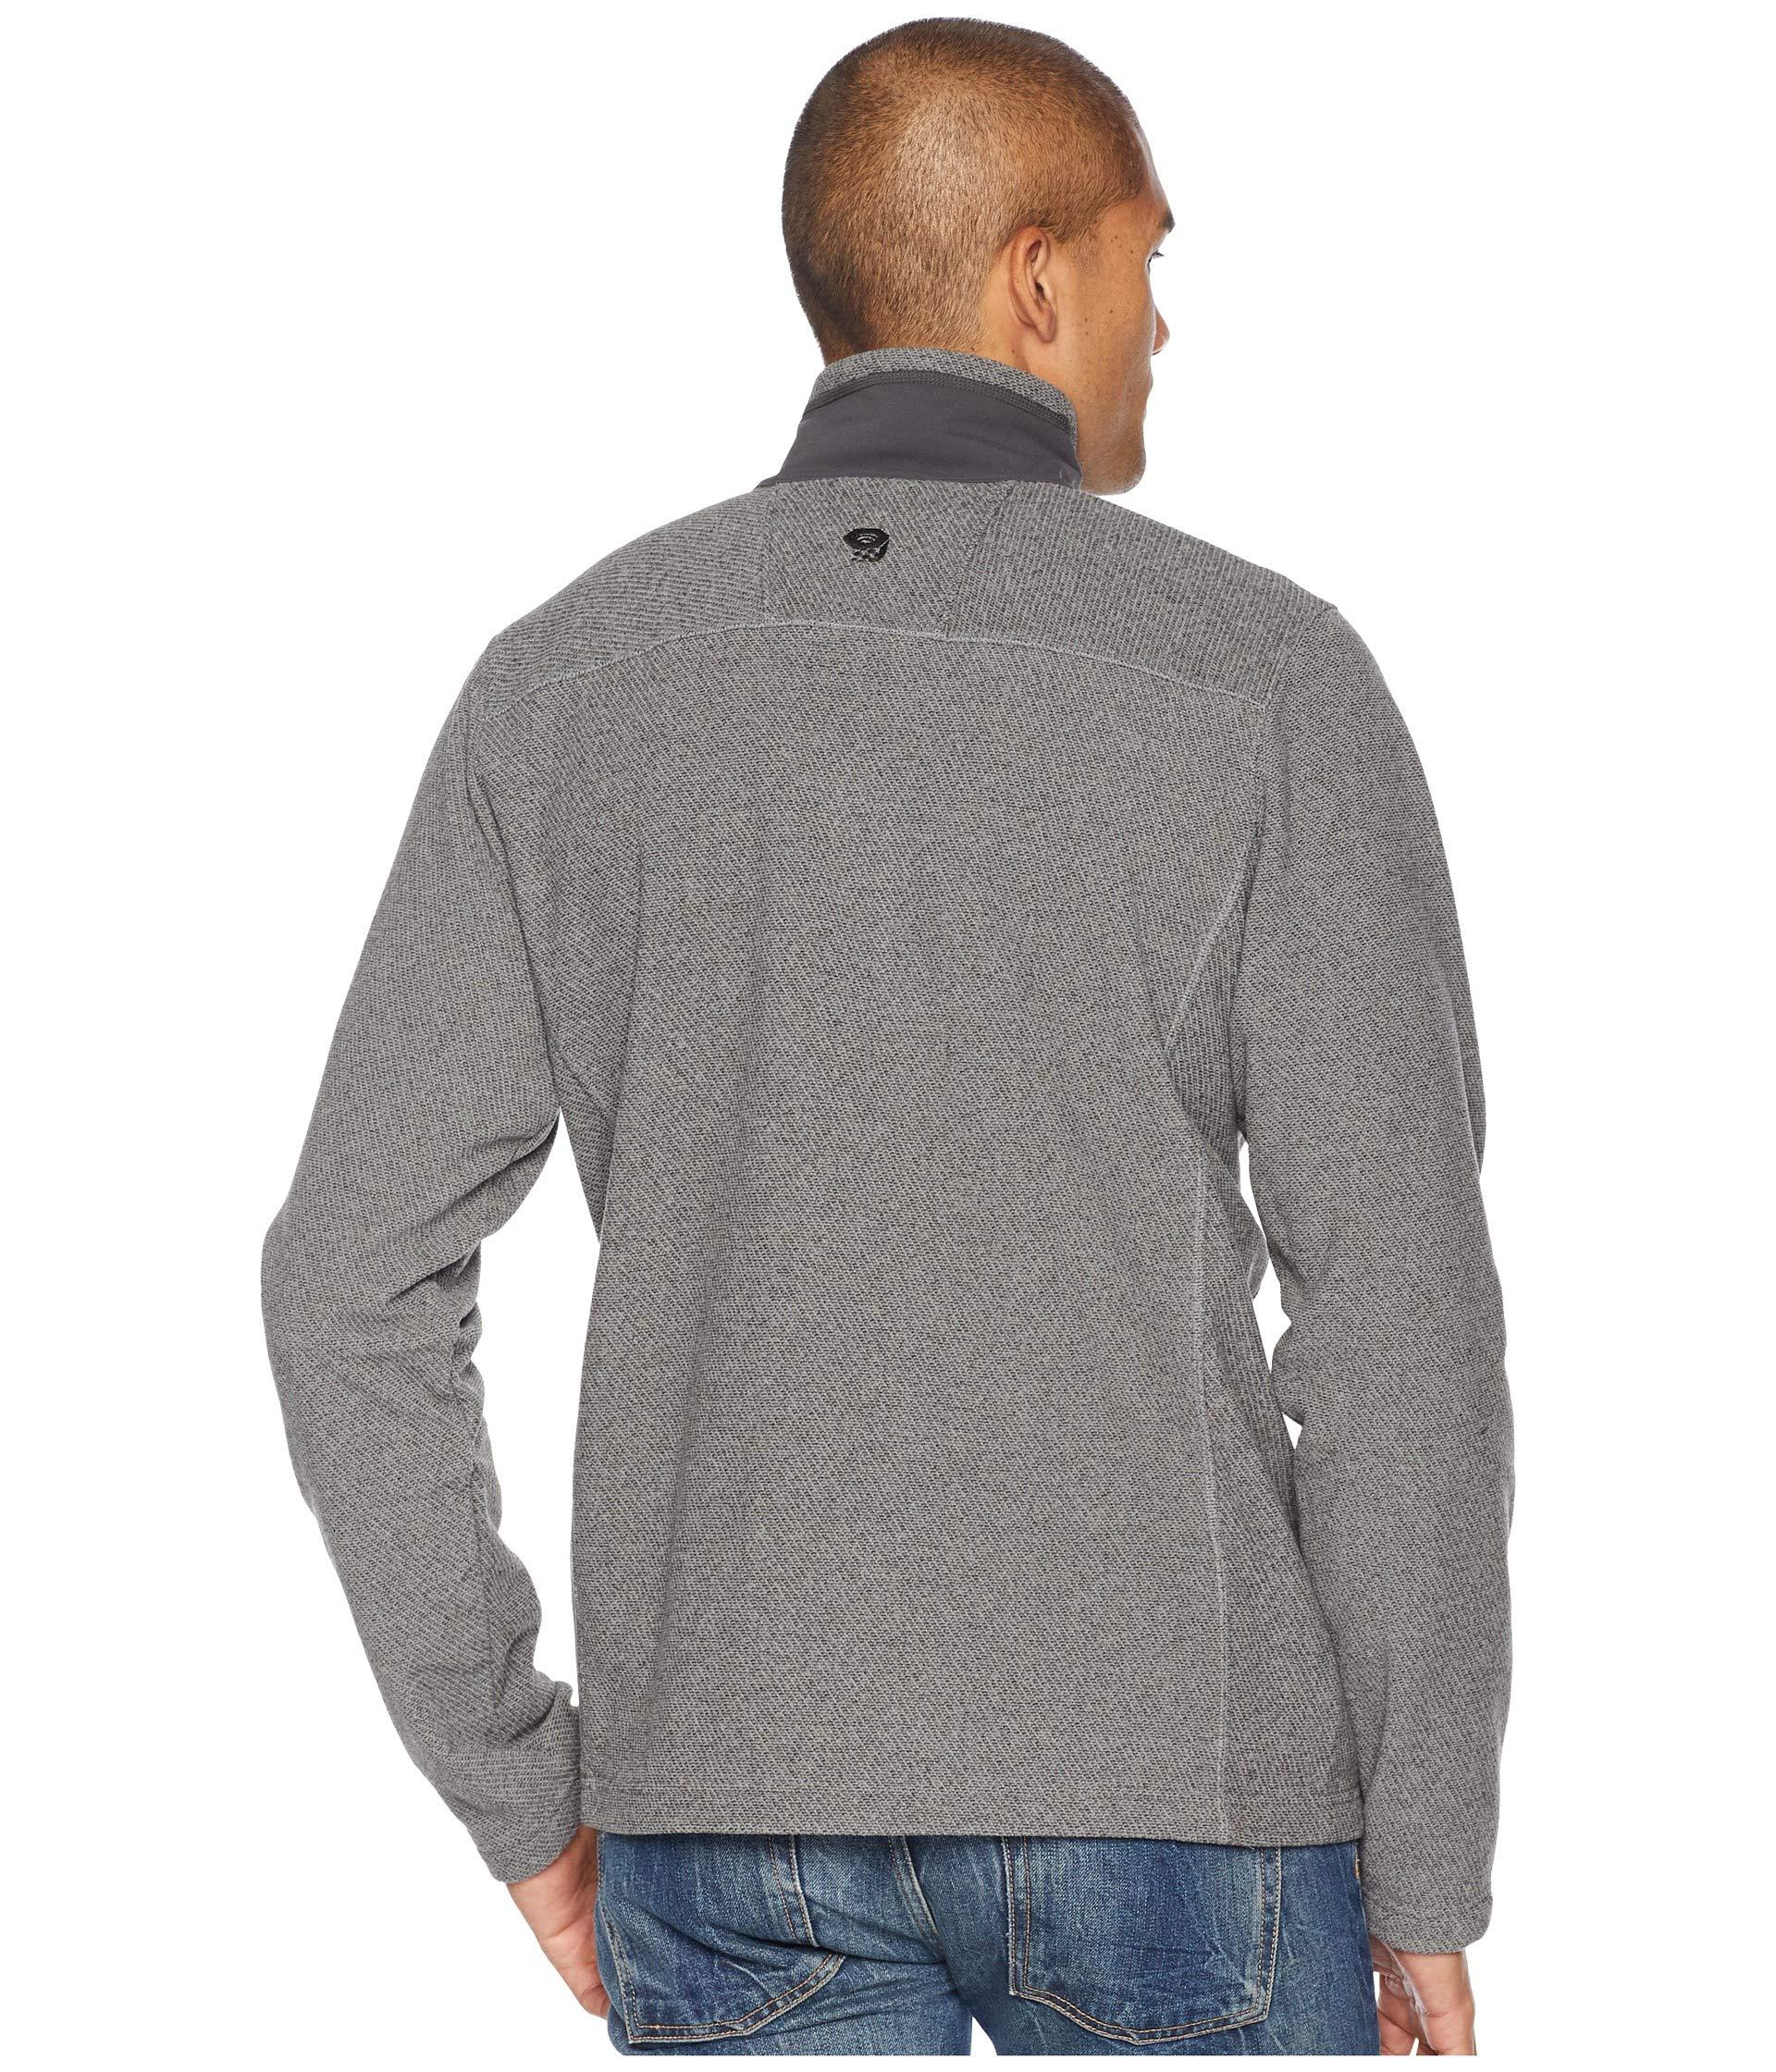 Twill 1 Fleece Hardwear Mountain Toasty 2 Zip Manta Grey E1FFZqw